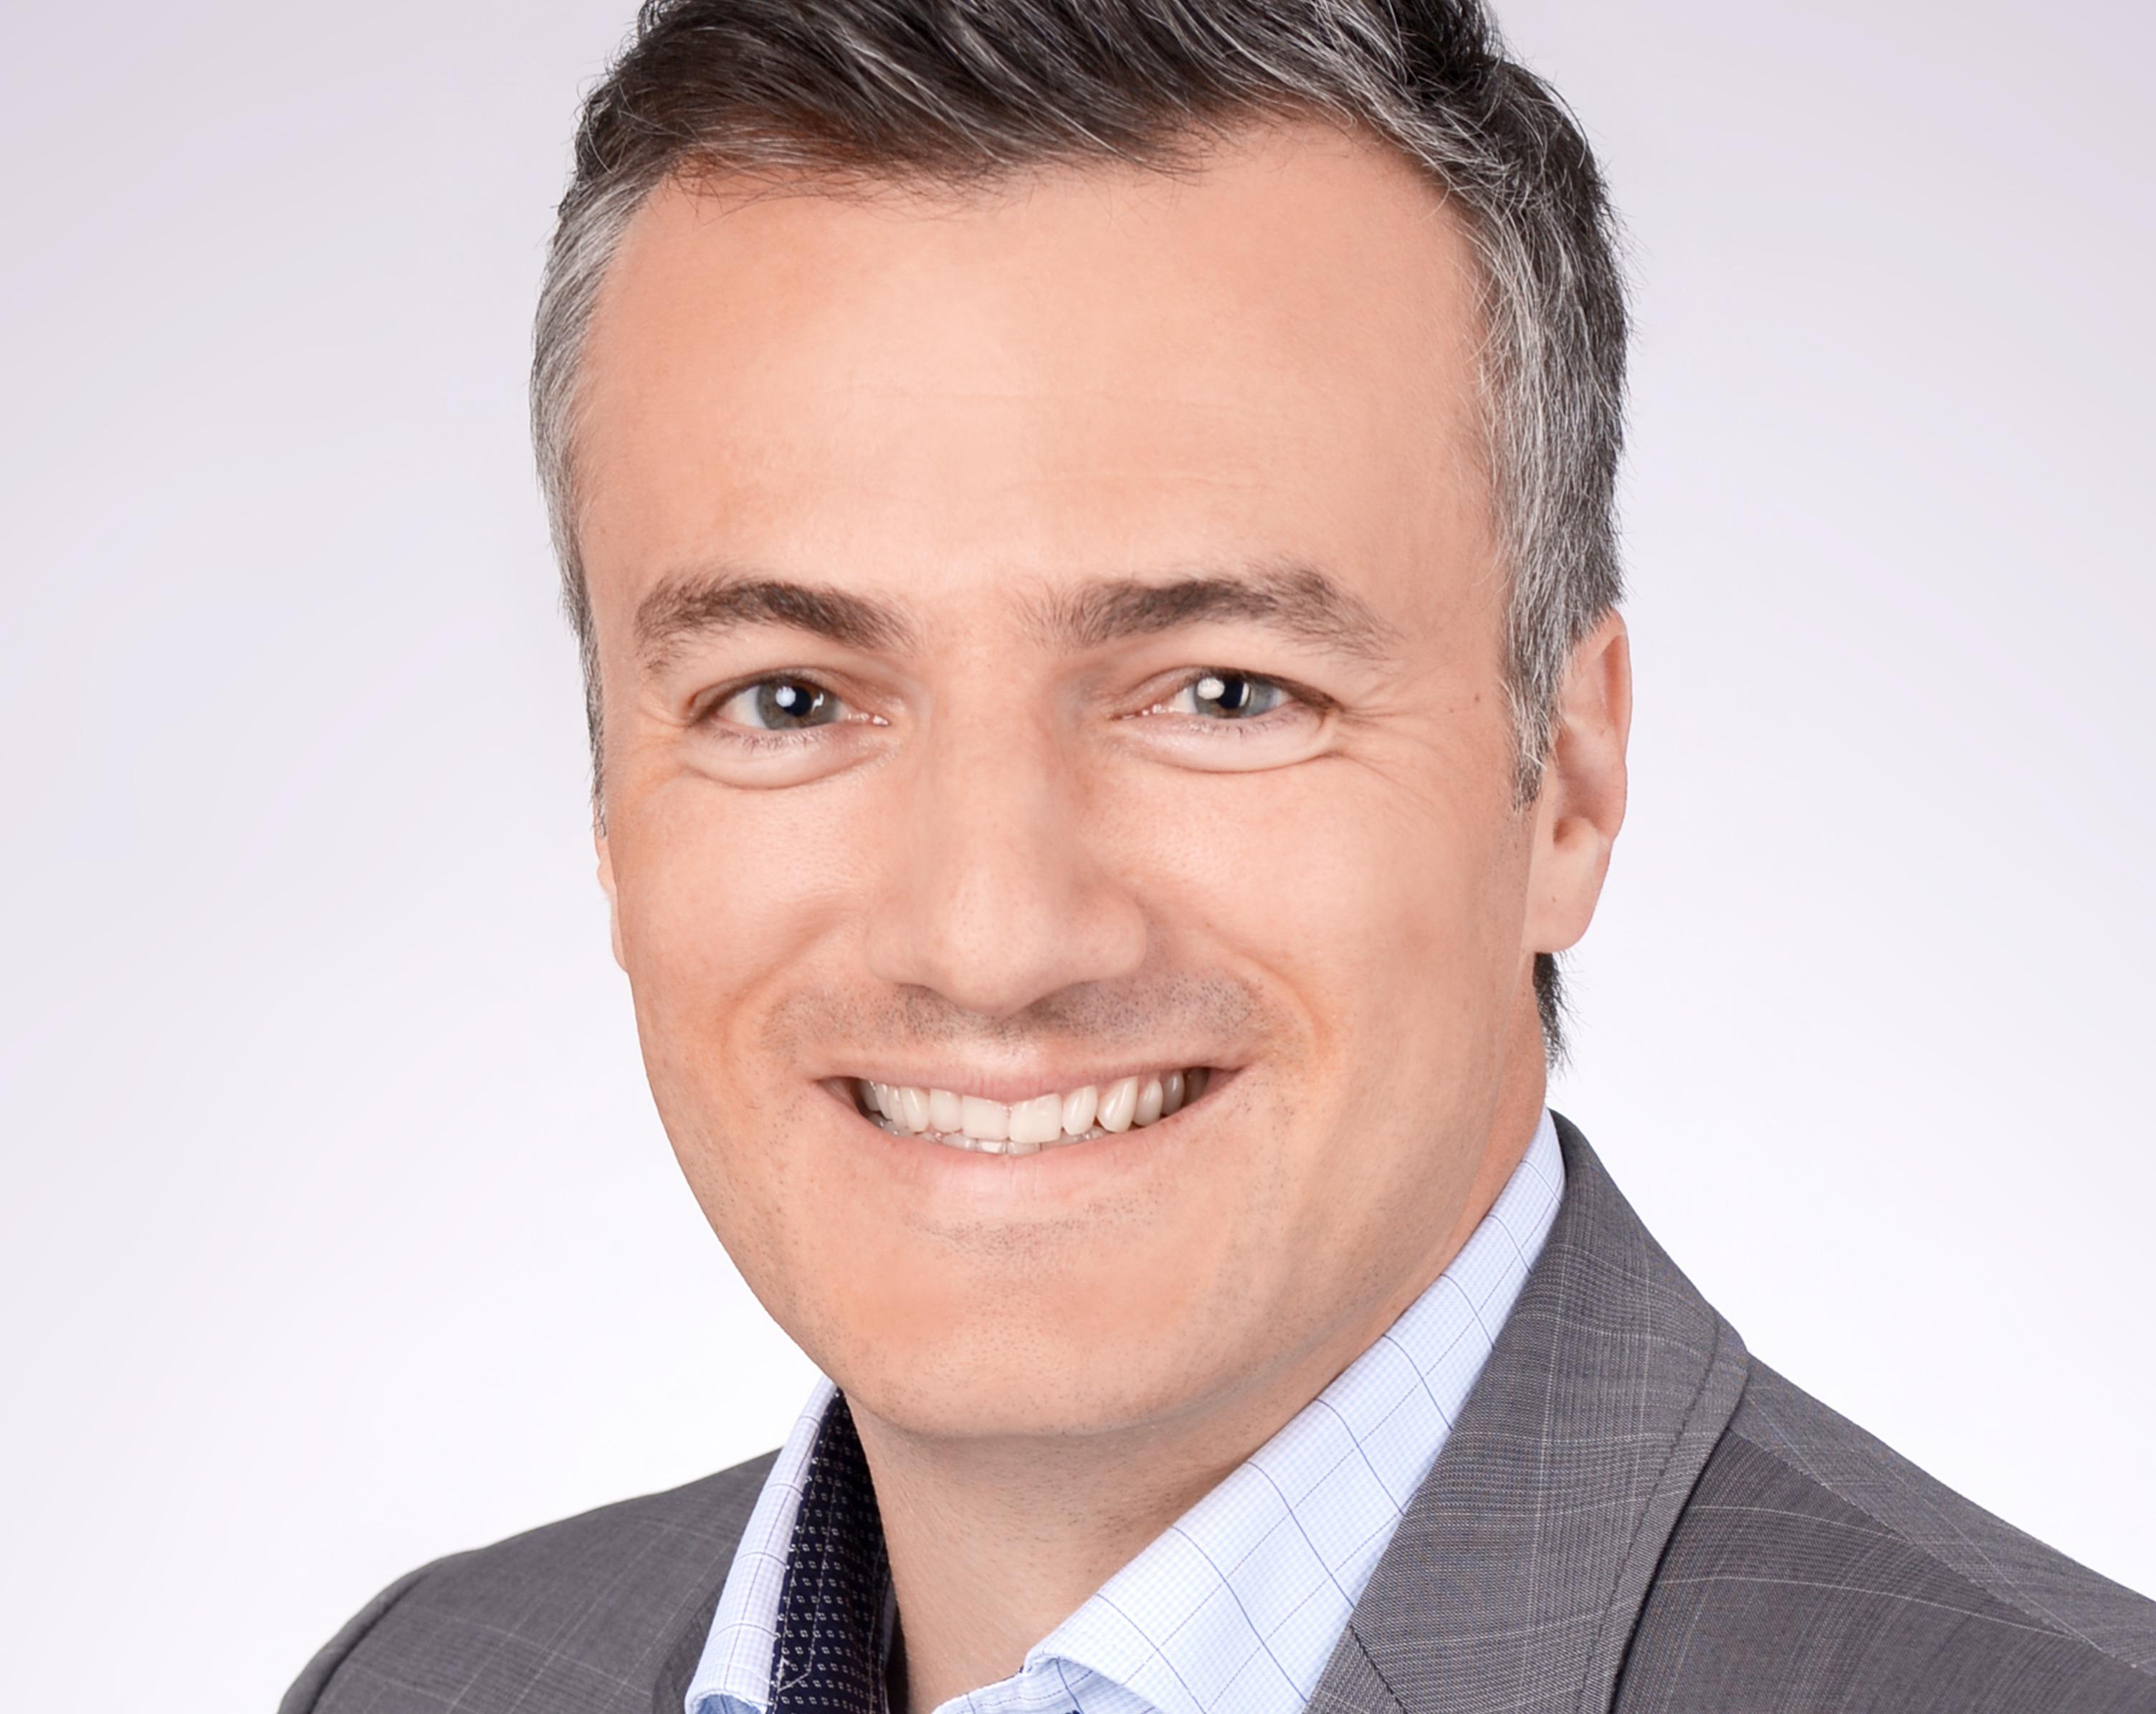 Rene_Konrad_Profil_BSI_Banking_cmm360